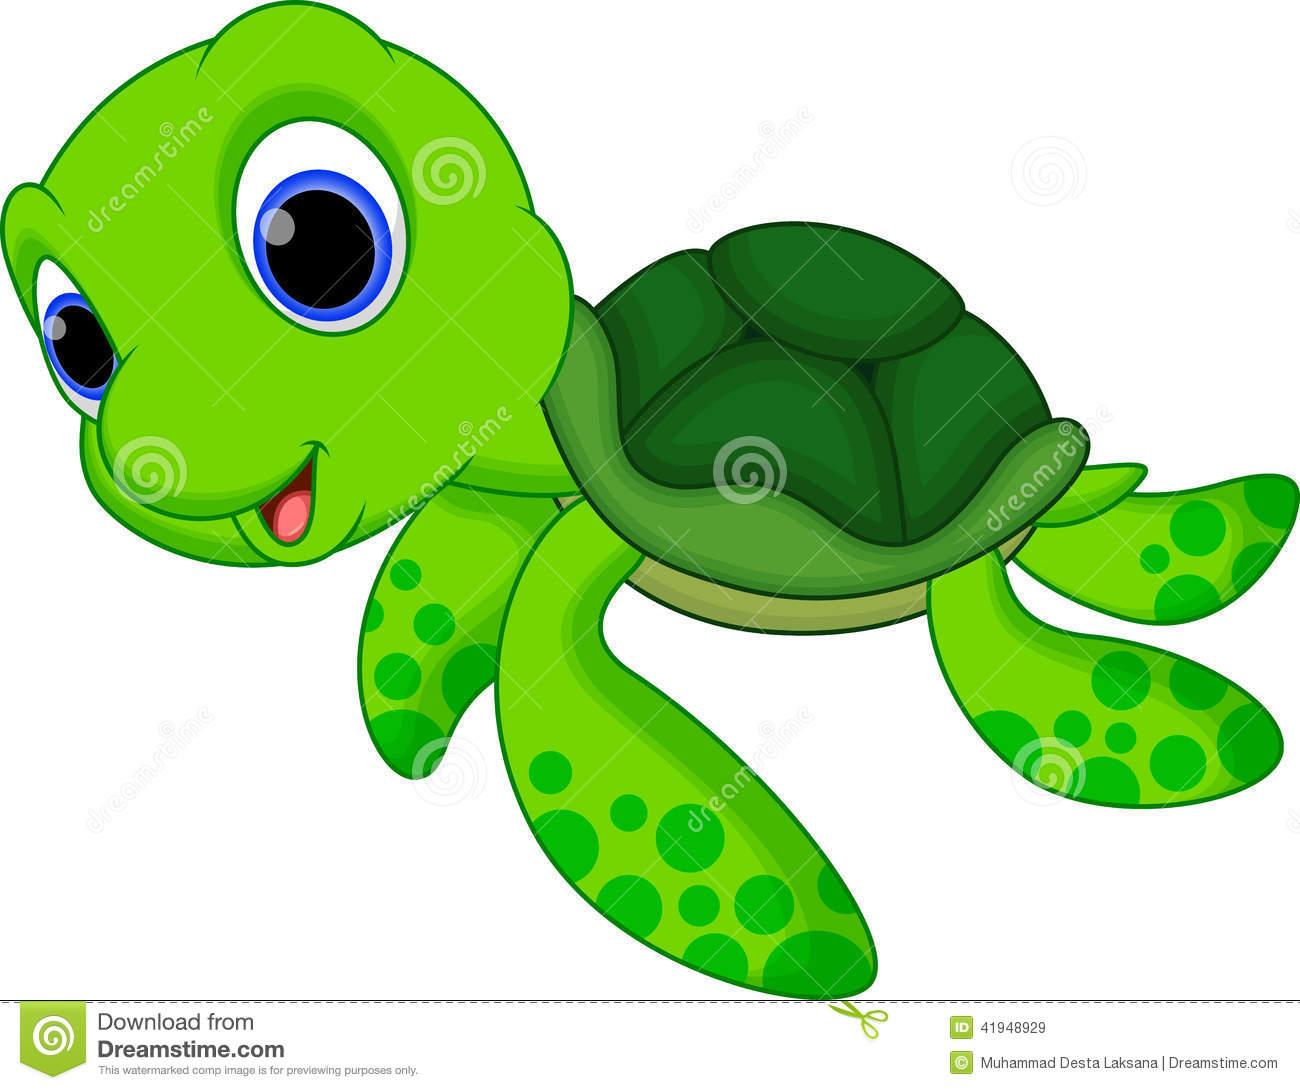 Cute animated sea turtles - photo#1